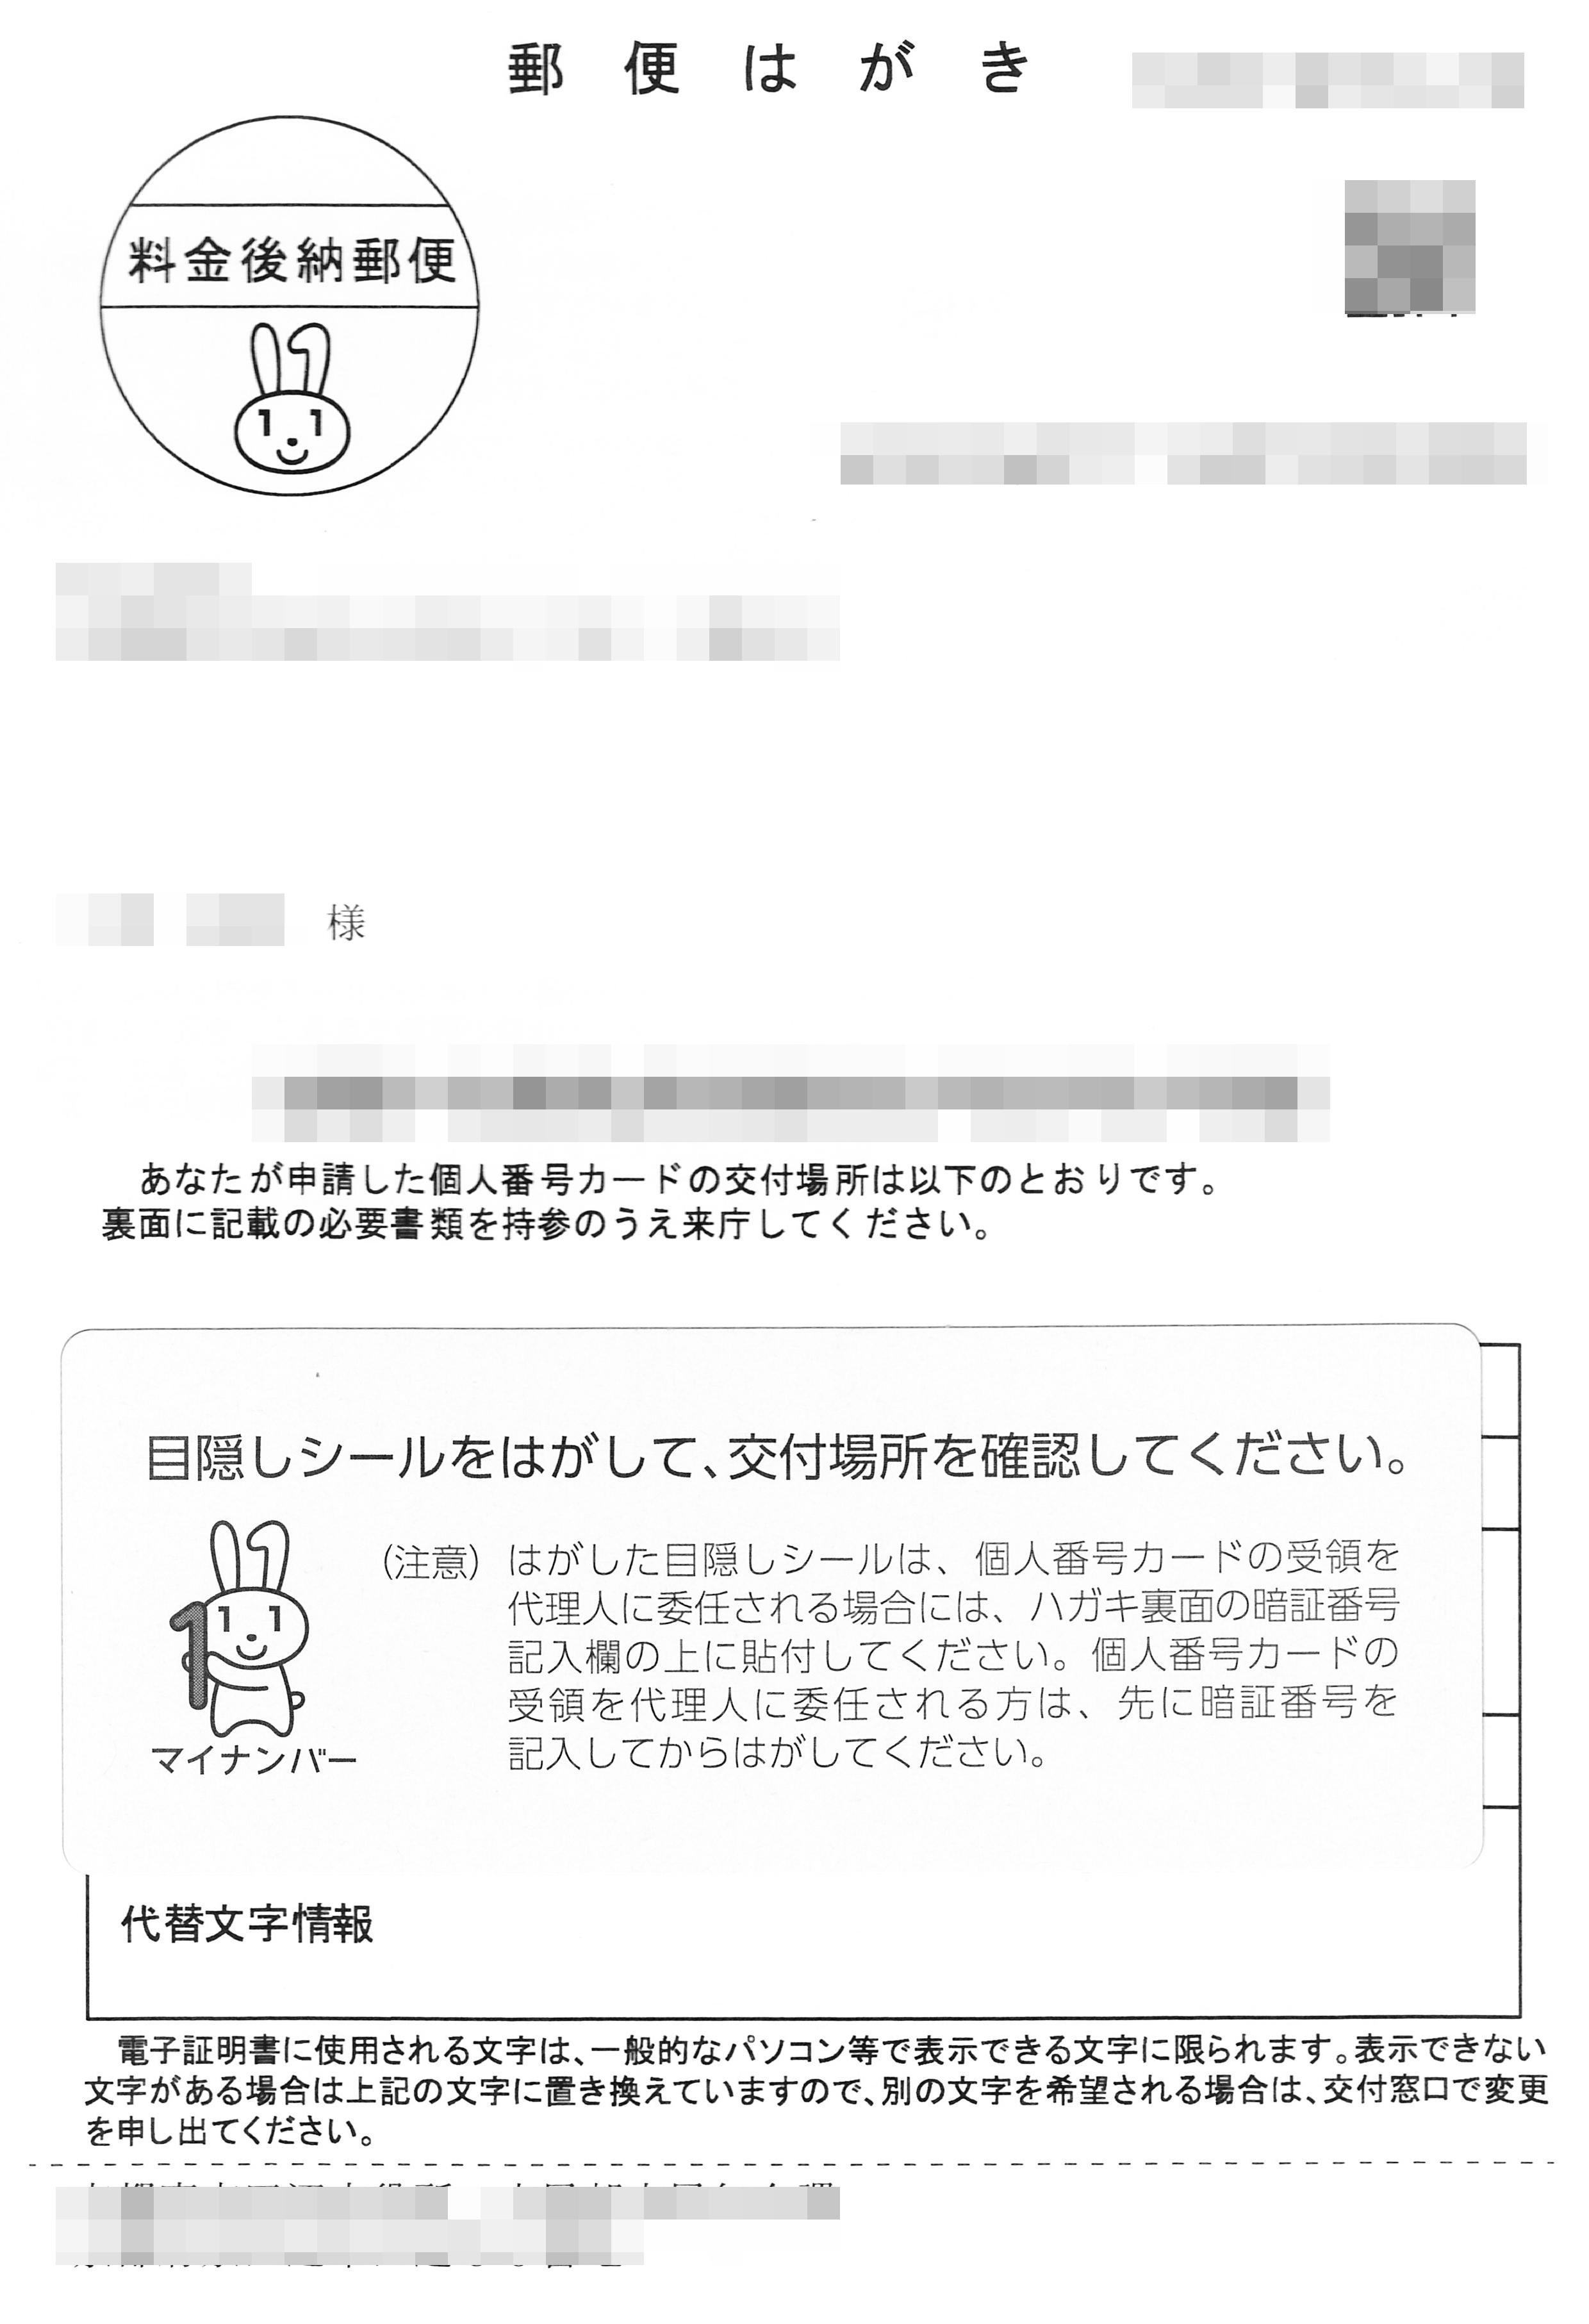 mynumbercard_postcard1m.jpg